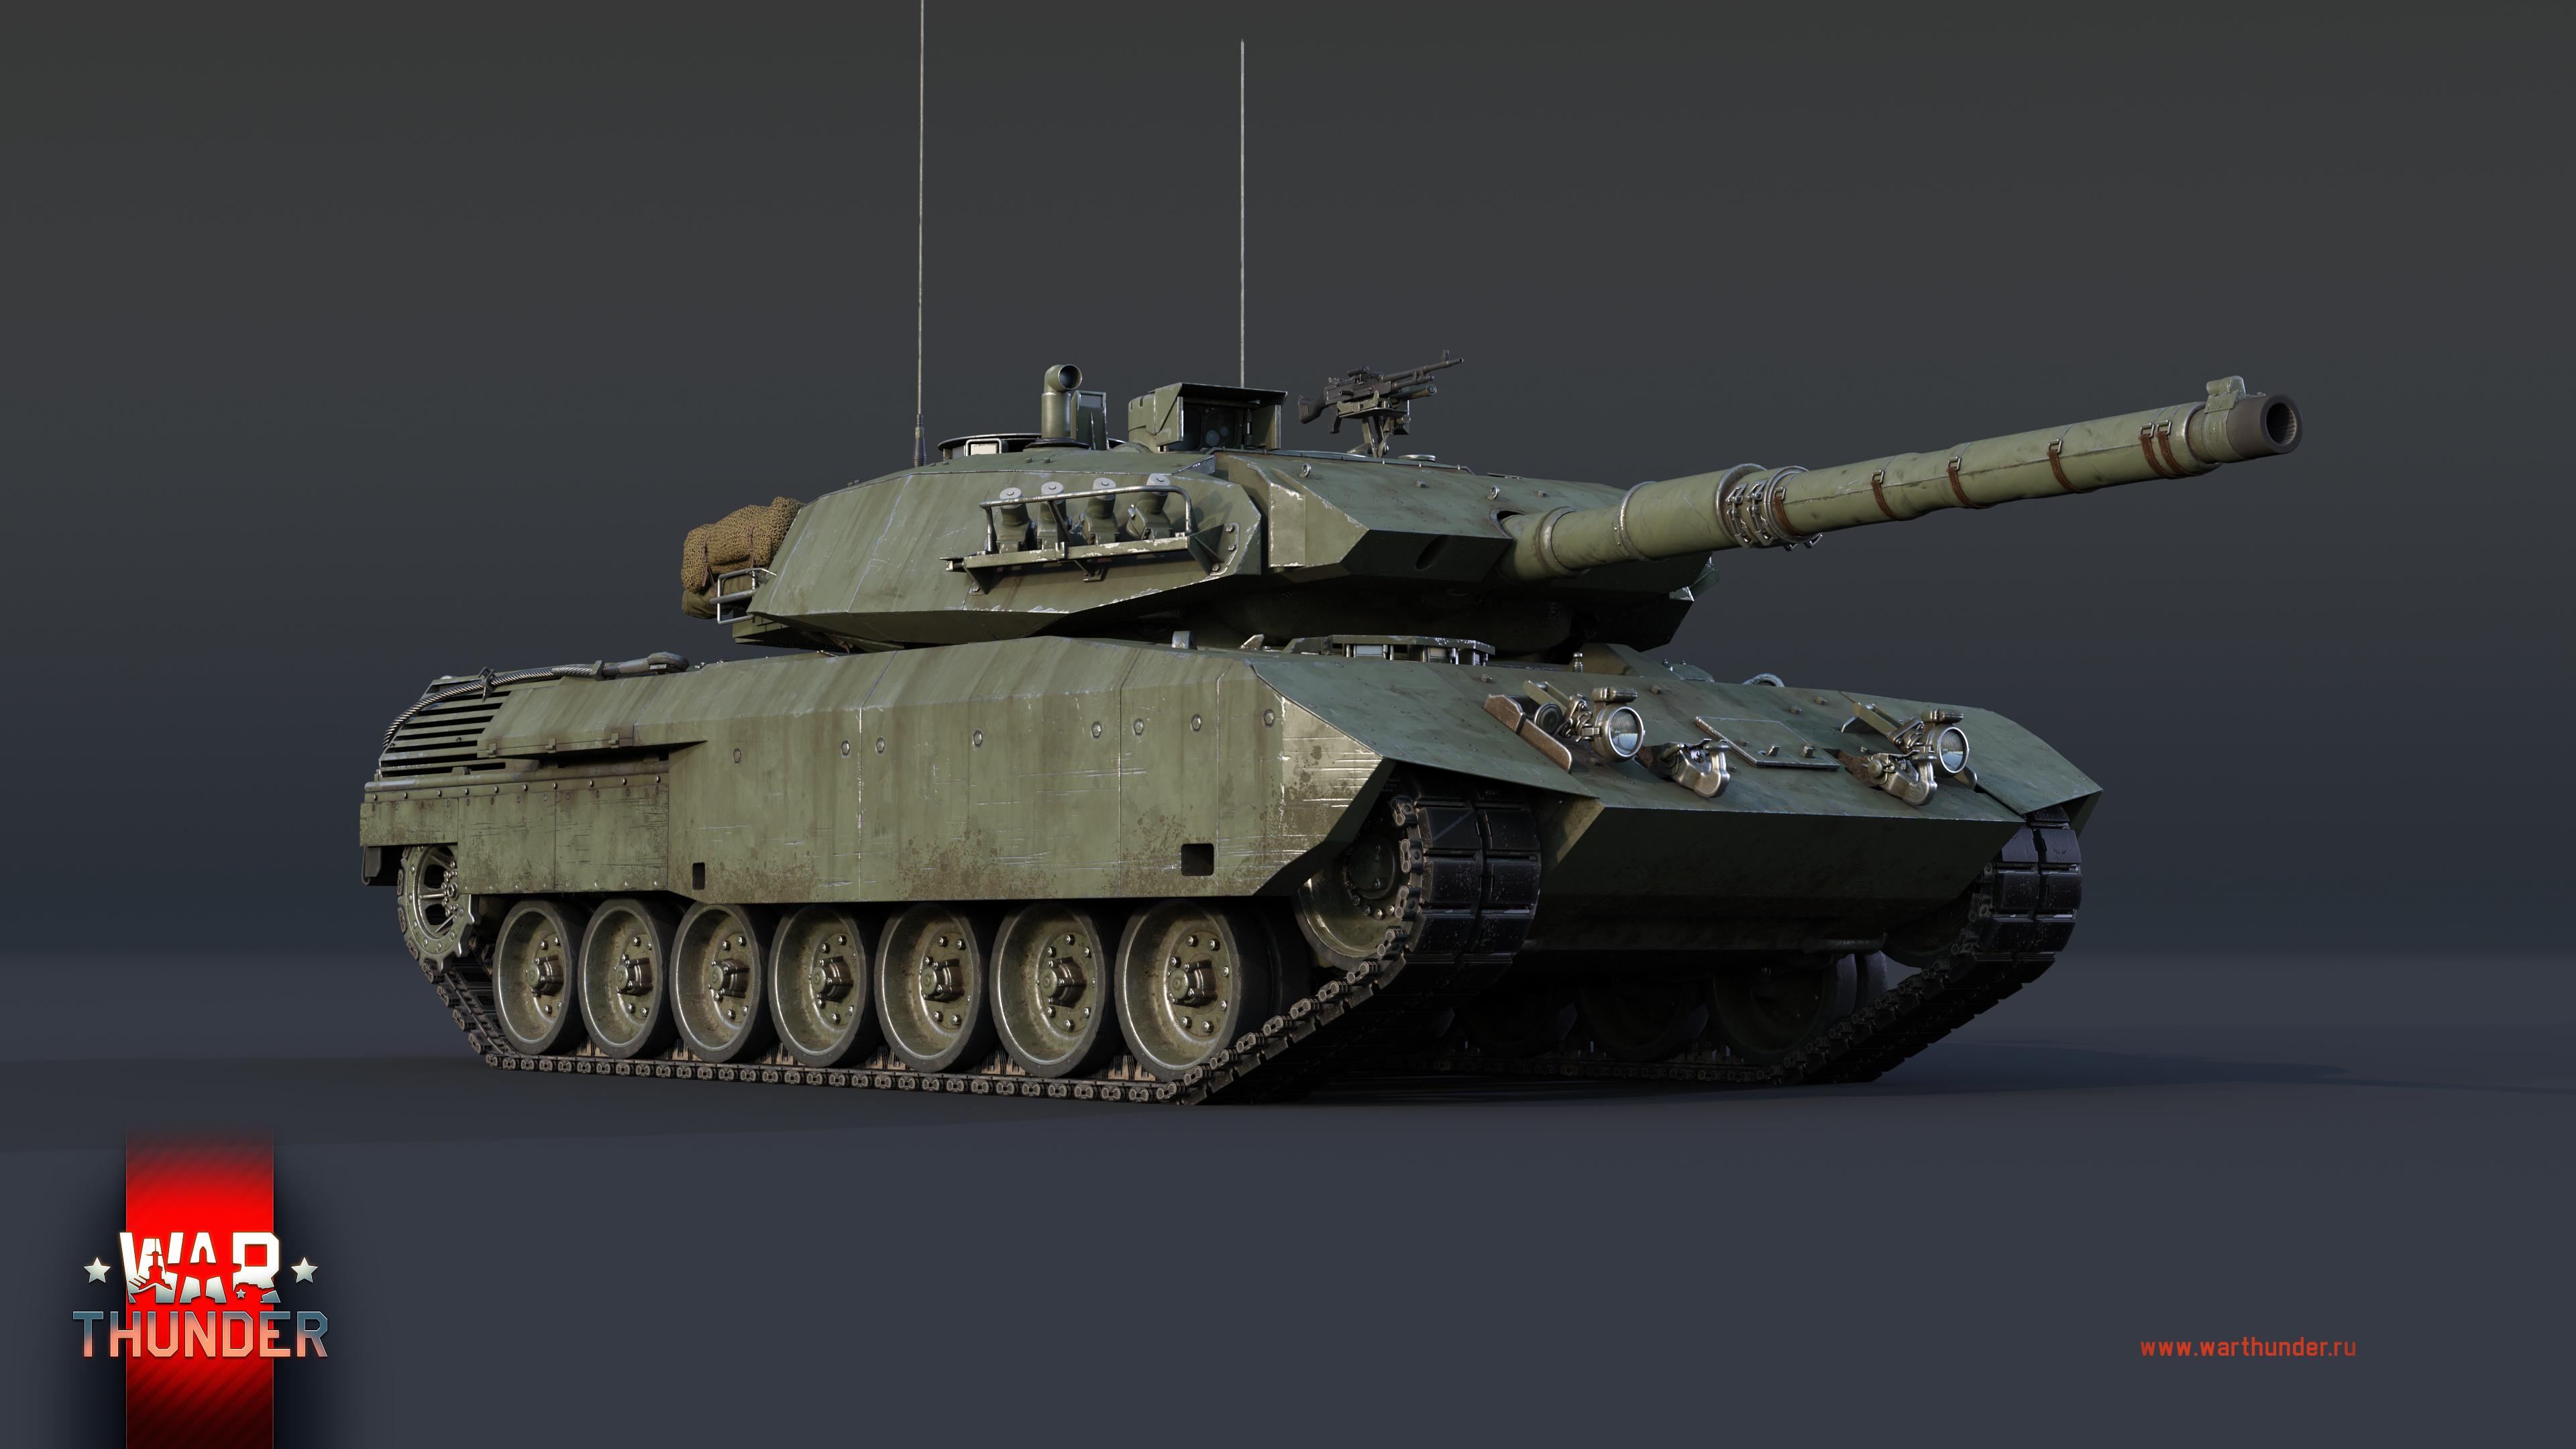 leopard_c2_mexas_3840x2160_logo_ru_237c4